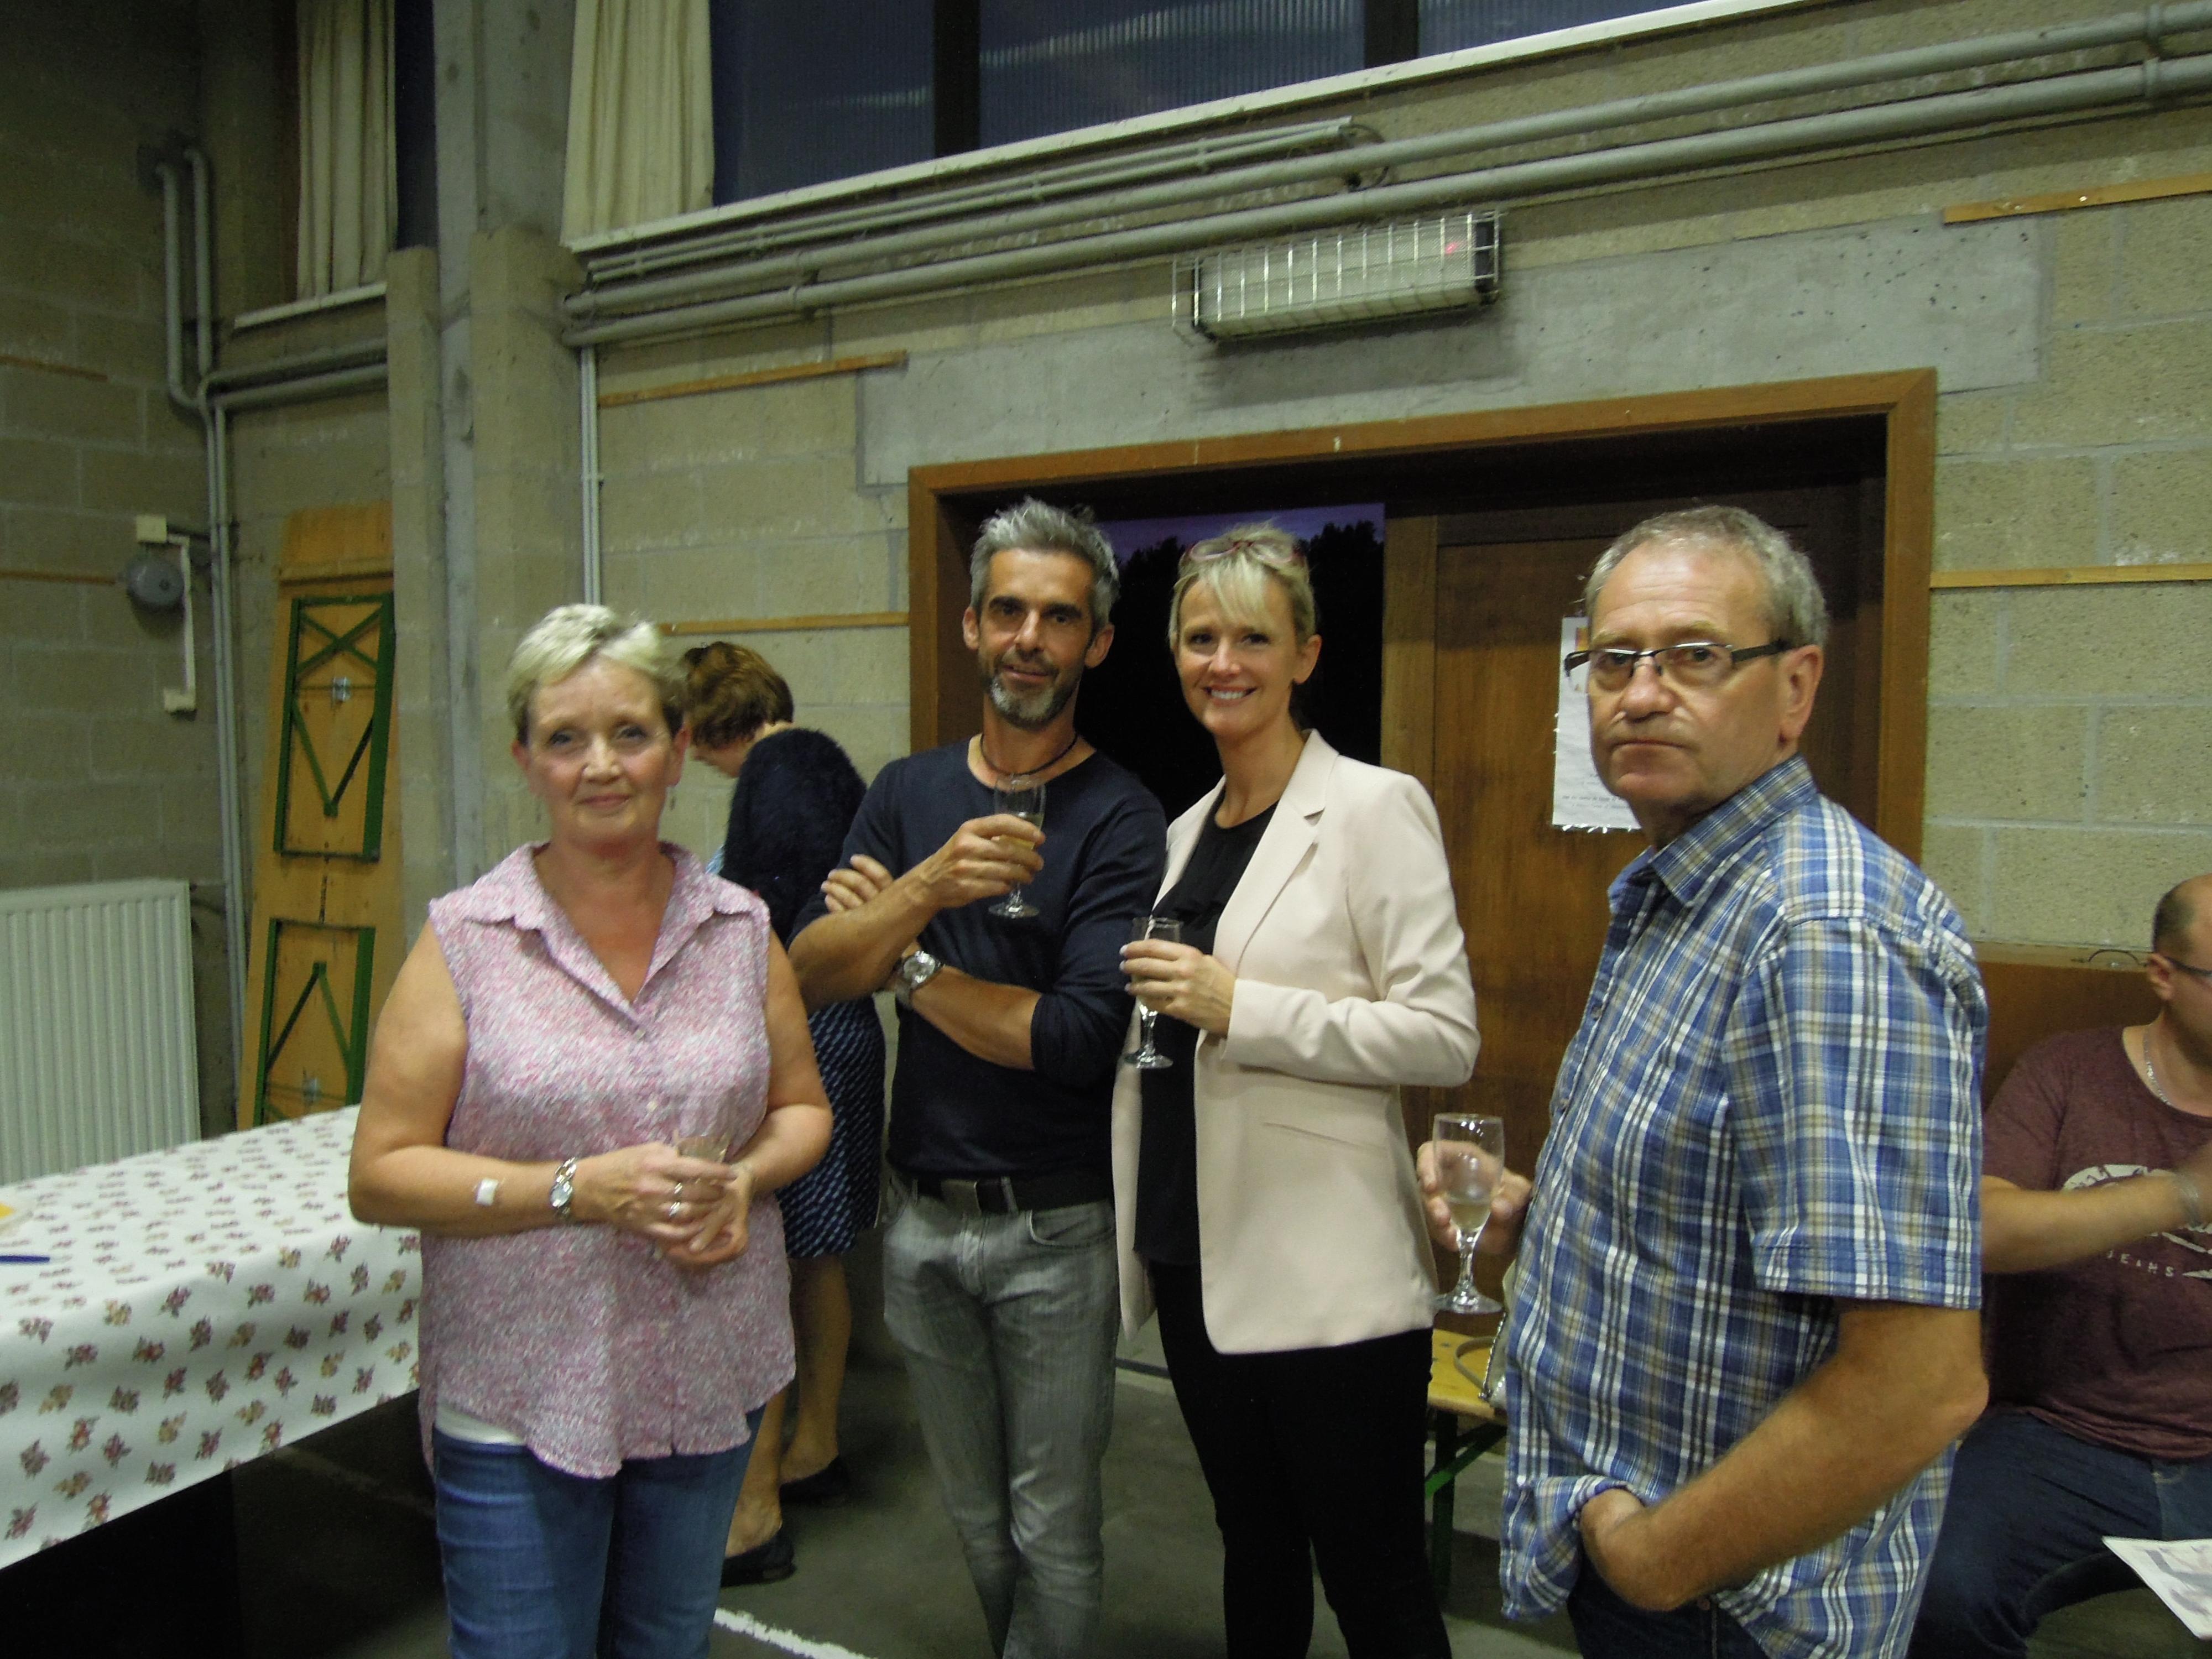 Et si Mons dansait - Club danse Mons - PO 2018-09-10